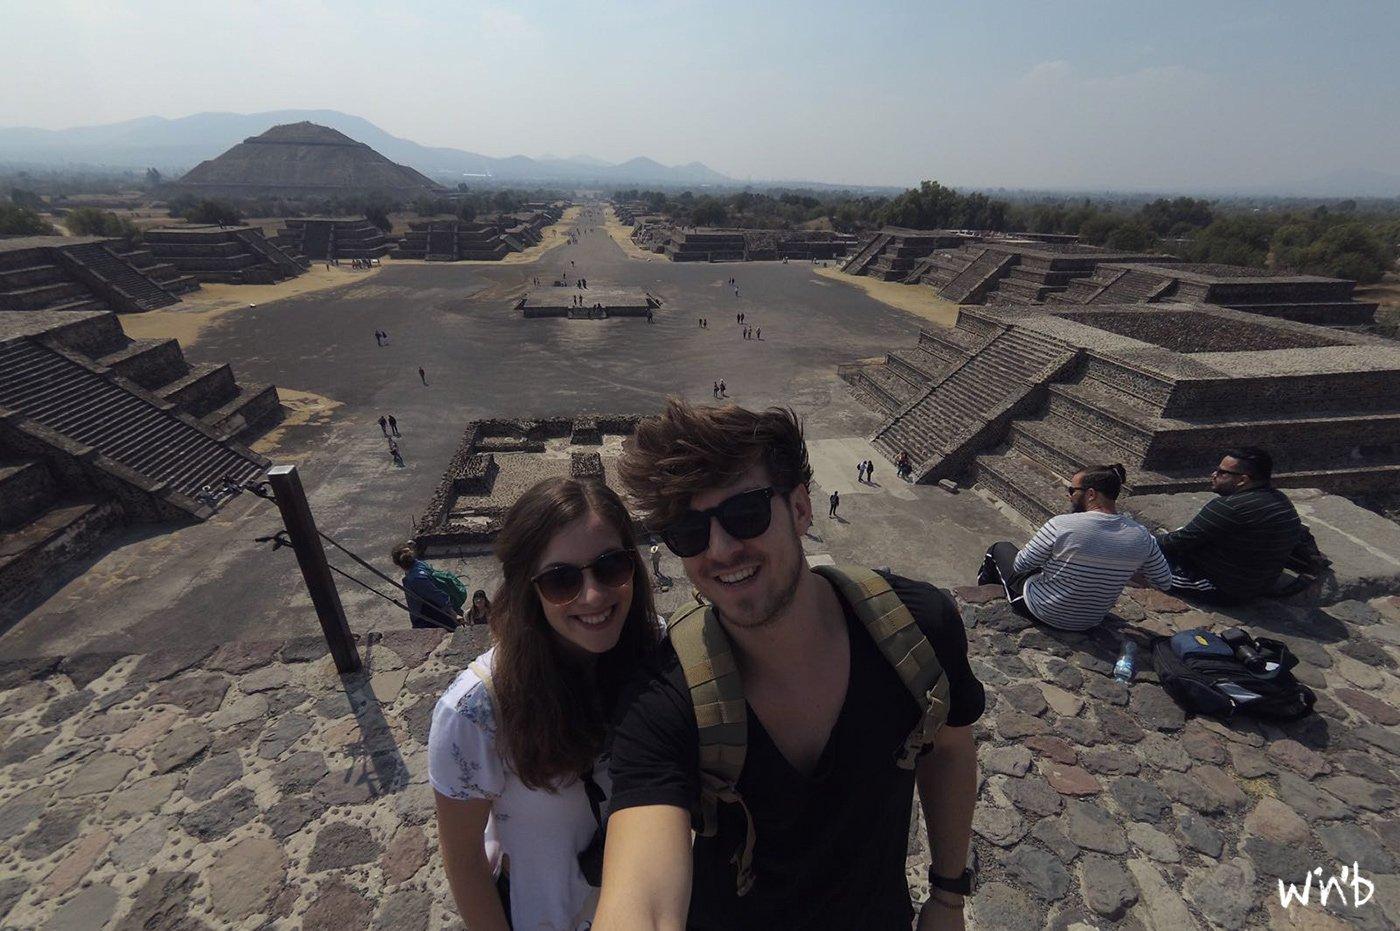 Pyramides de Teotihuacán